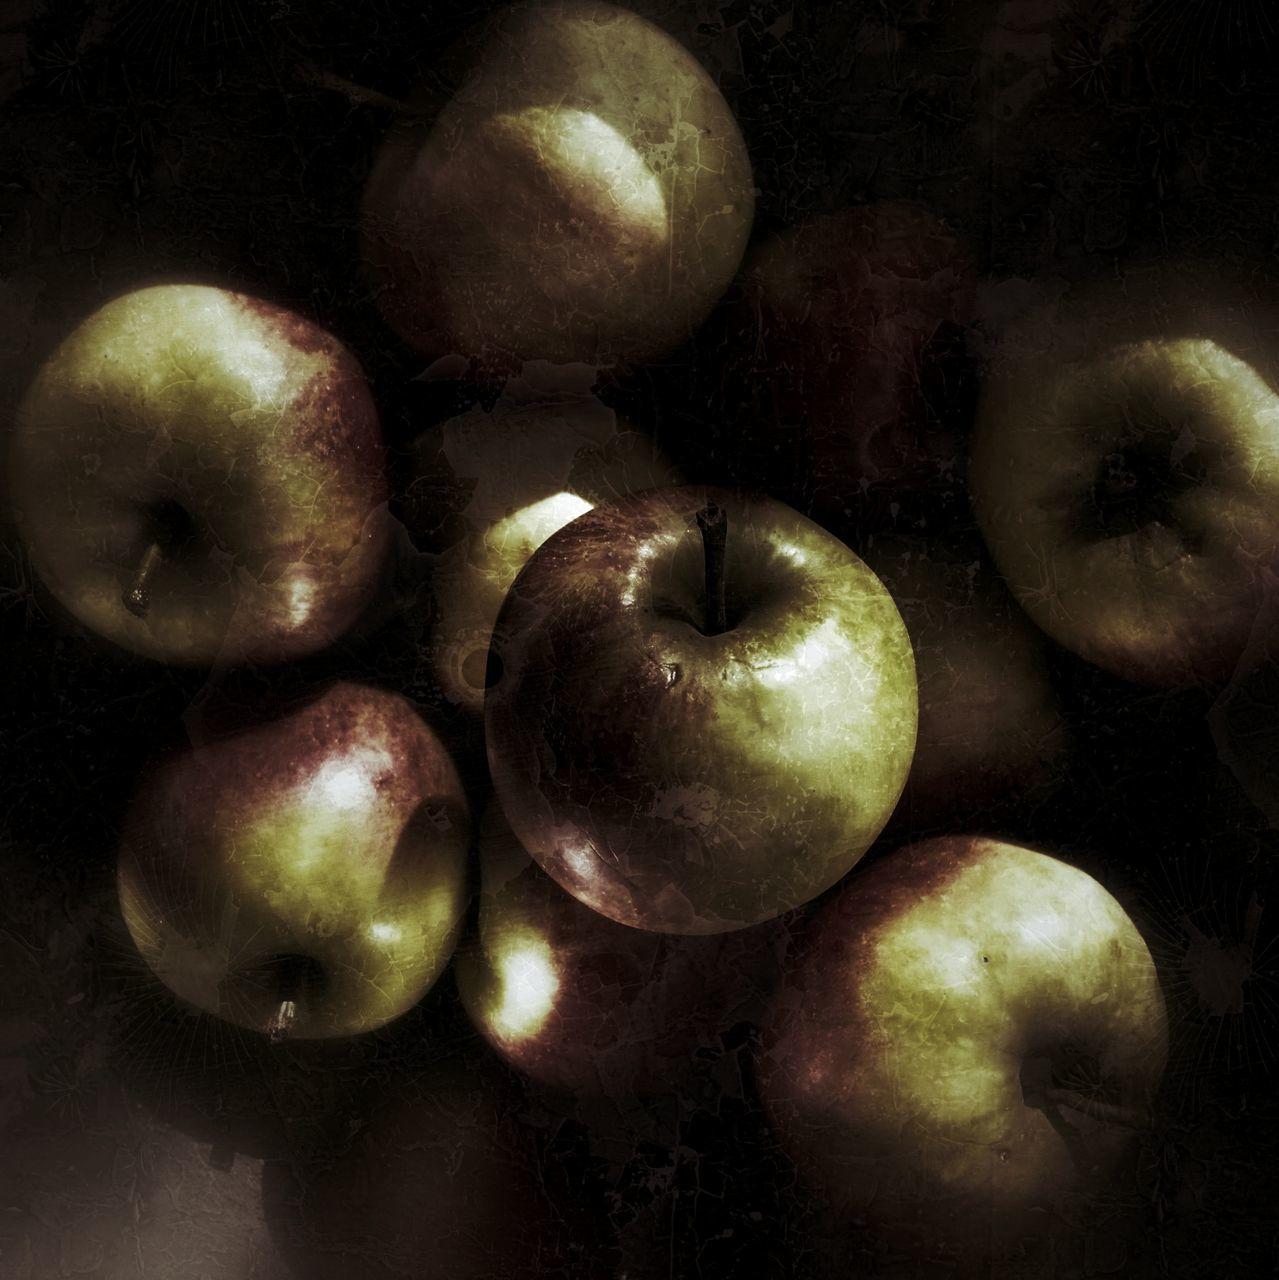 healthy eating, fruit, food and drink, freshness, food, apple - fruit, studio shot, no people, indoors, close-up, black background, day